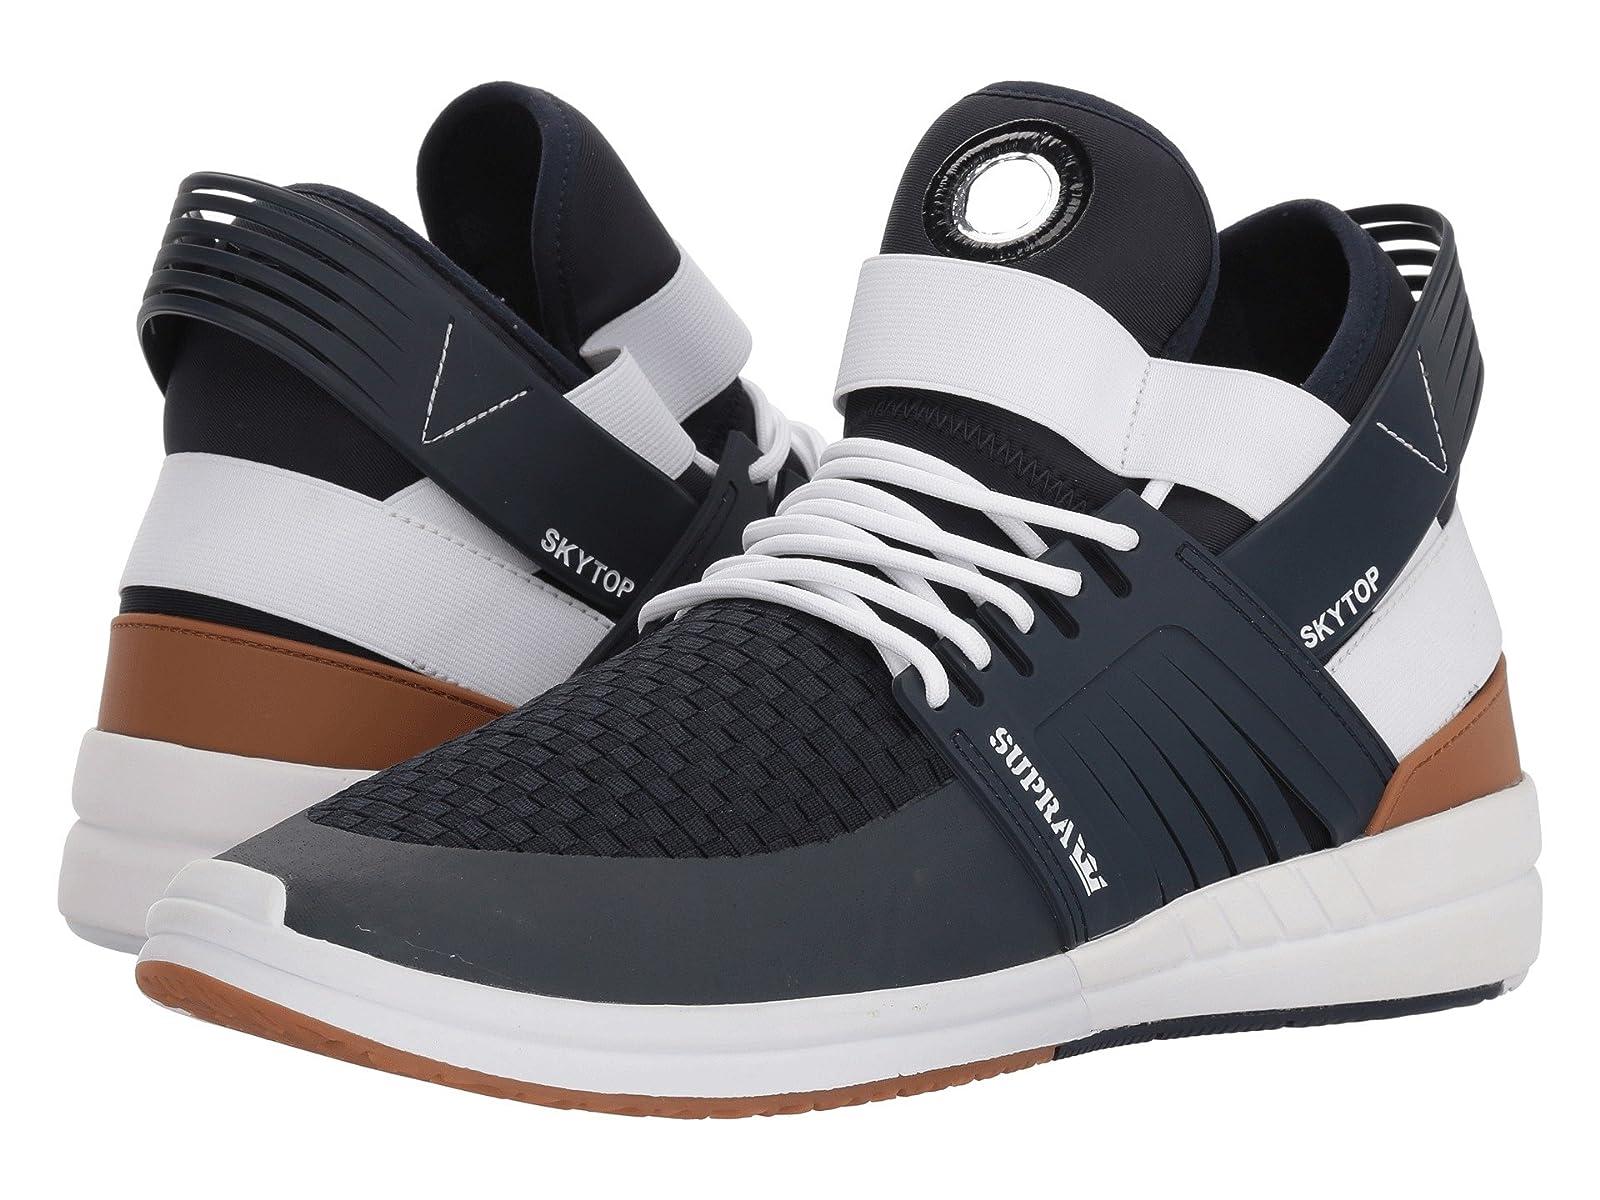 Supra Skytop VAtmospheric grades have affordable shoes